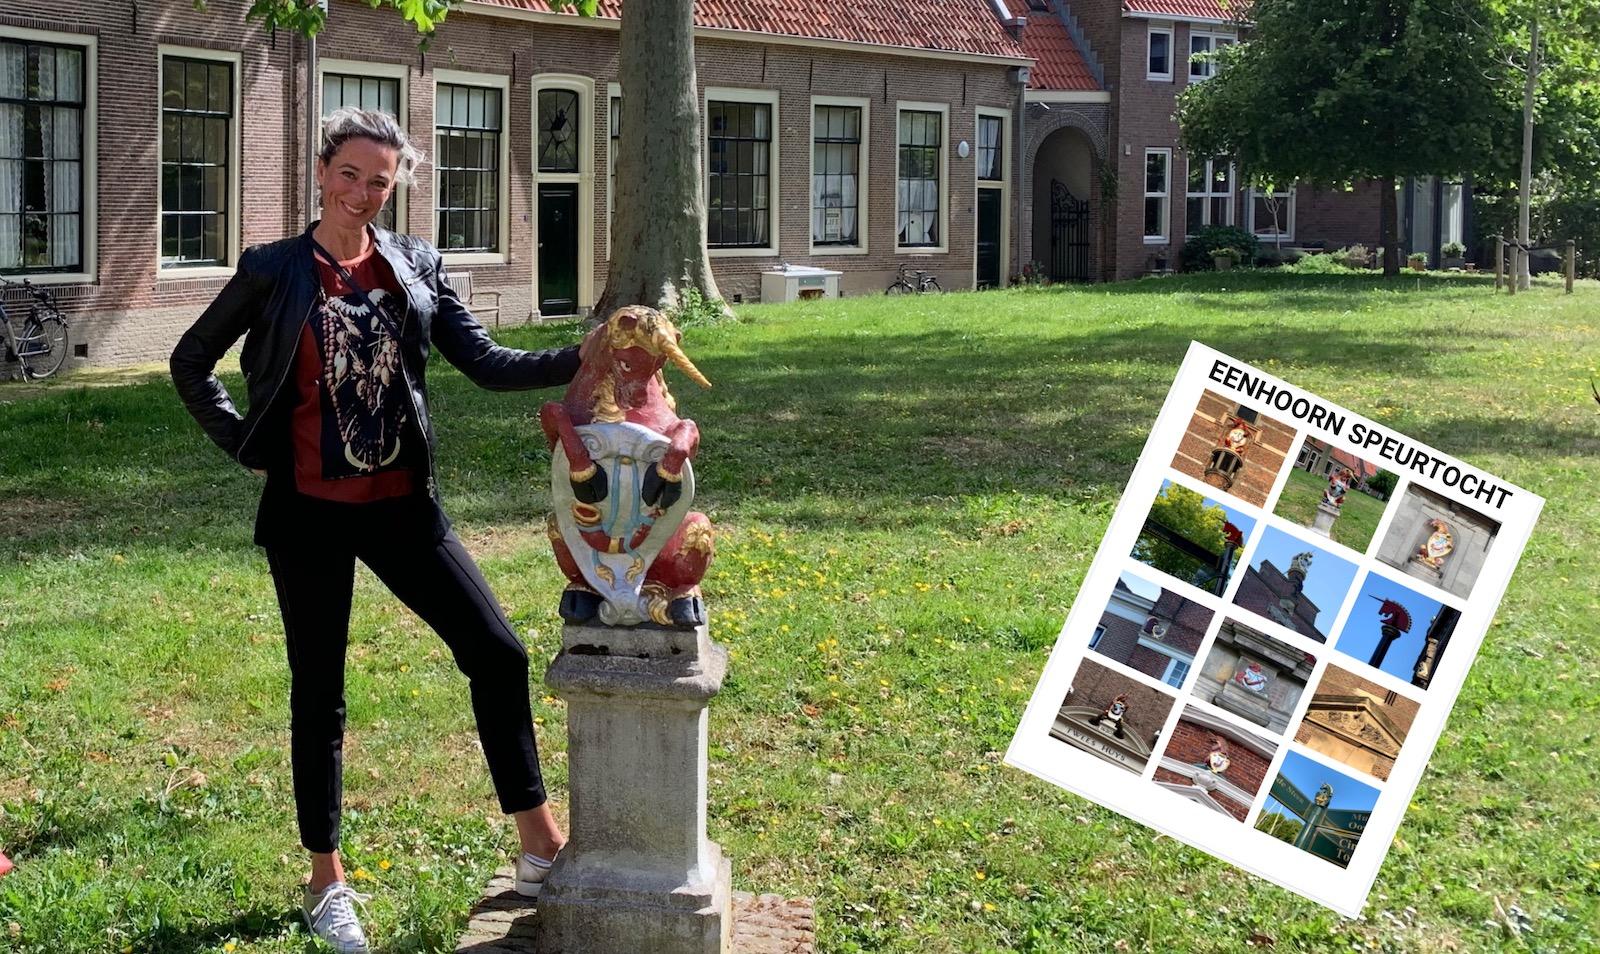 Familie rondleiding Hoorn met speurtocht - Local Guide Hoorn